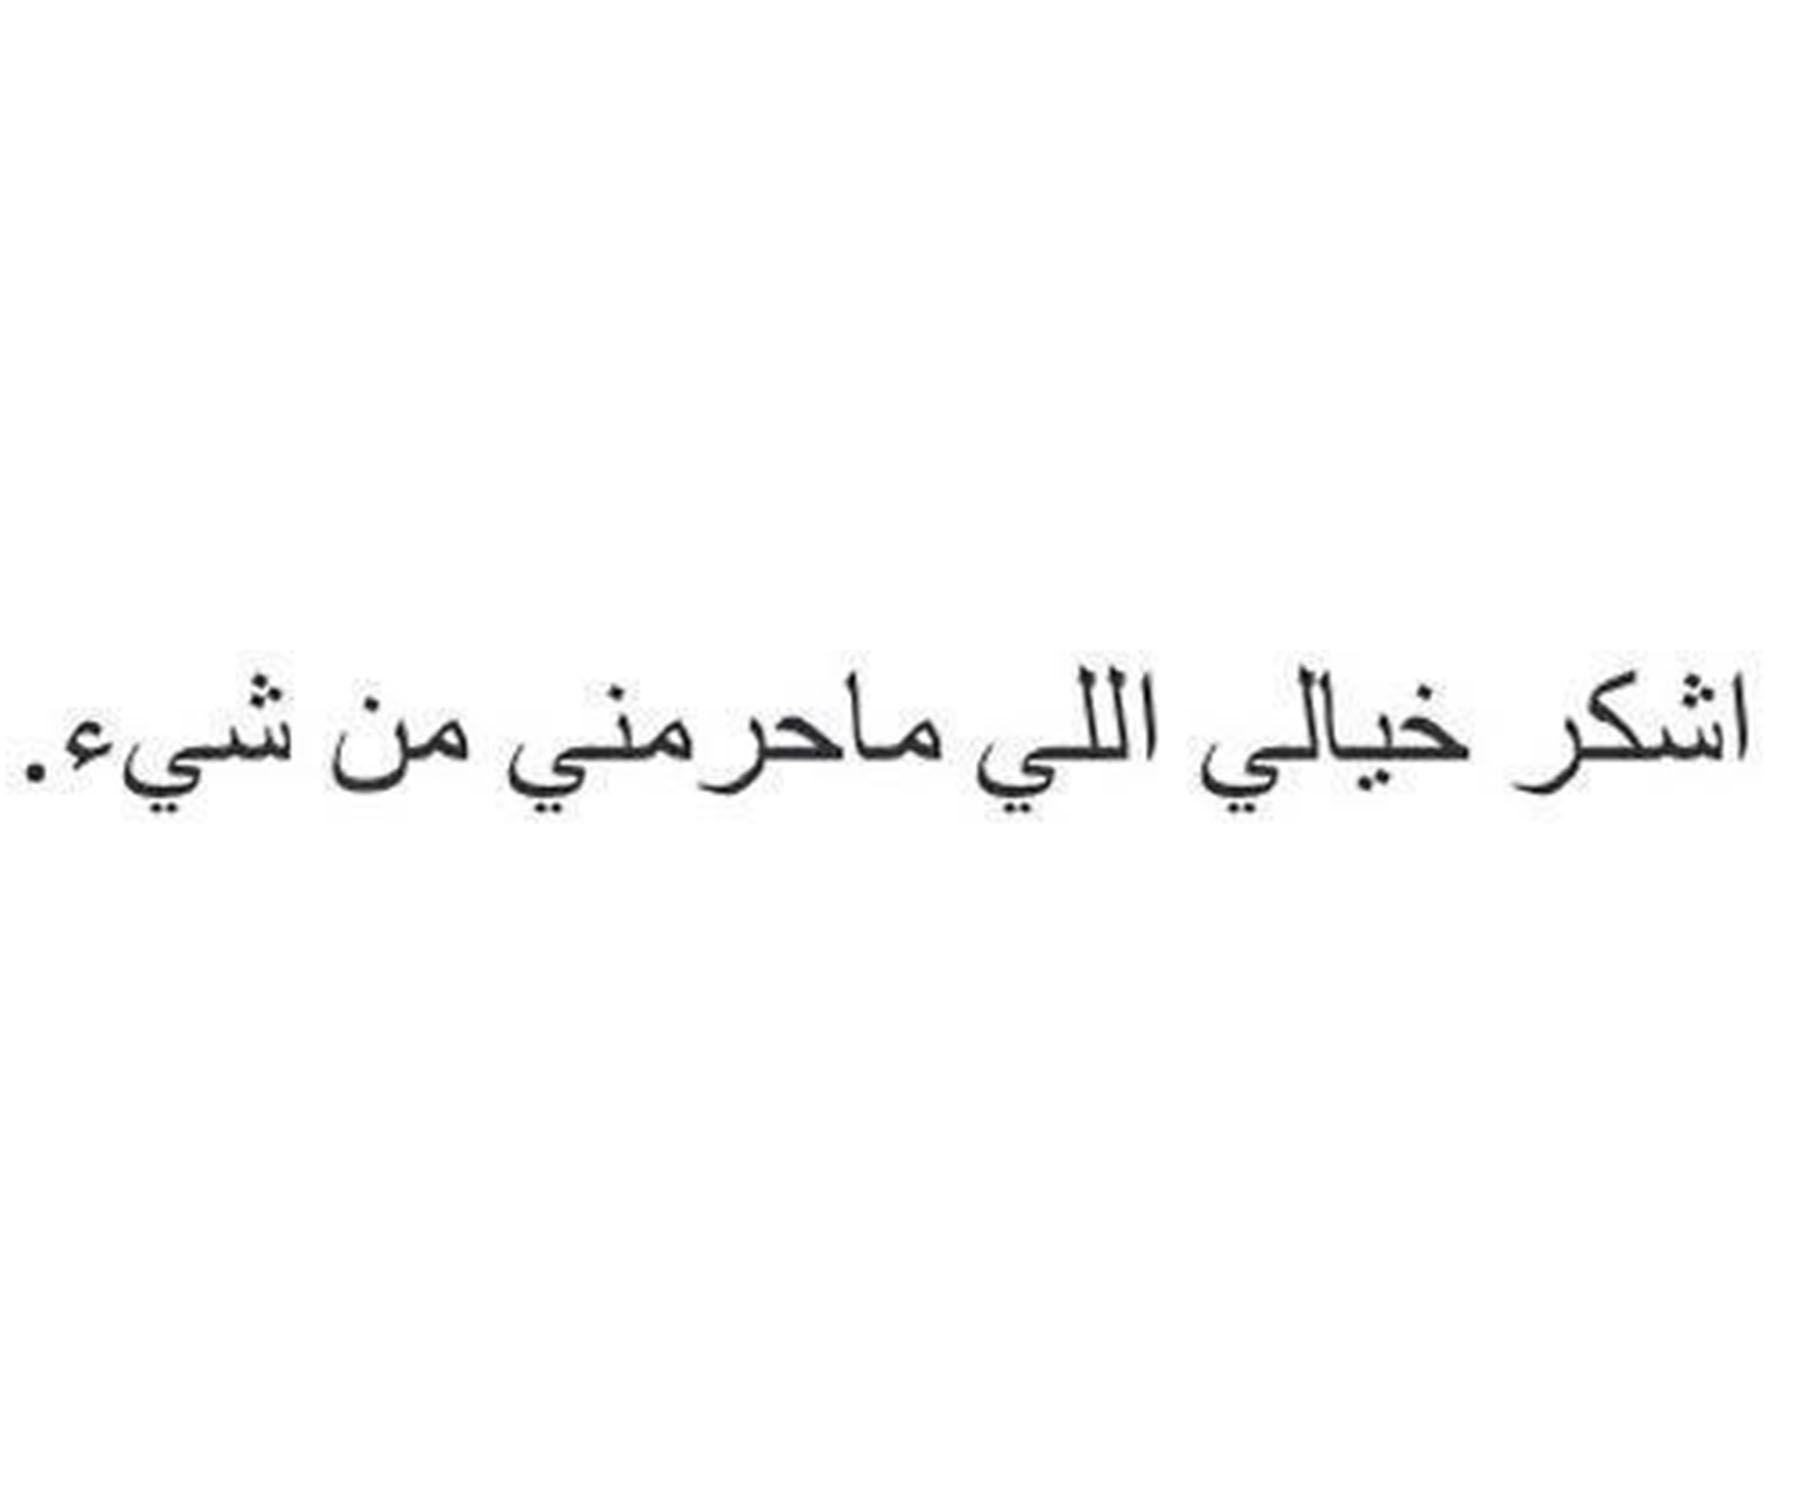 شكرا لك و ماقصرت True Words Arabic Quotes Words